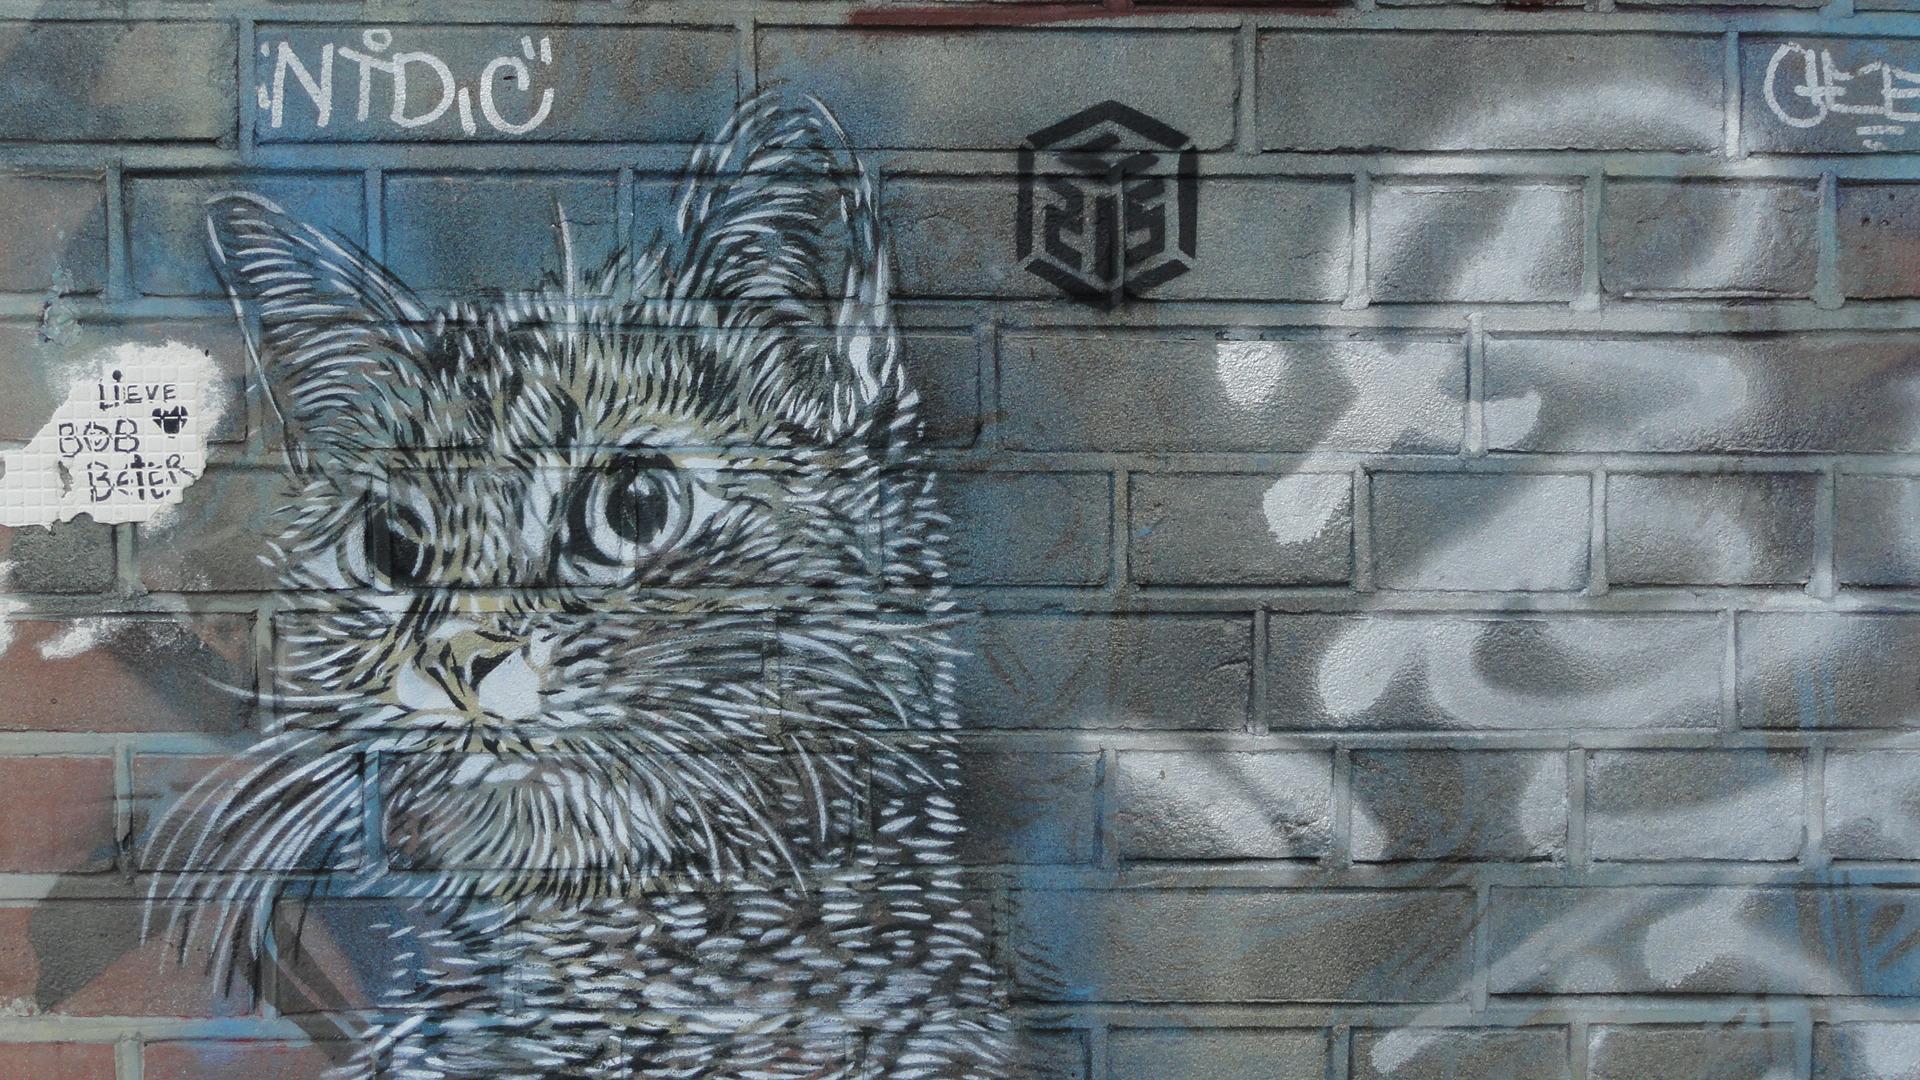 Amsterdam - Street art - Chat de C215